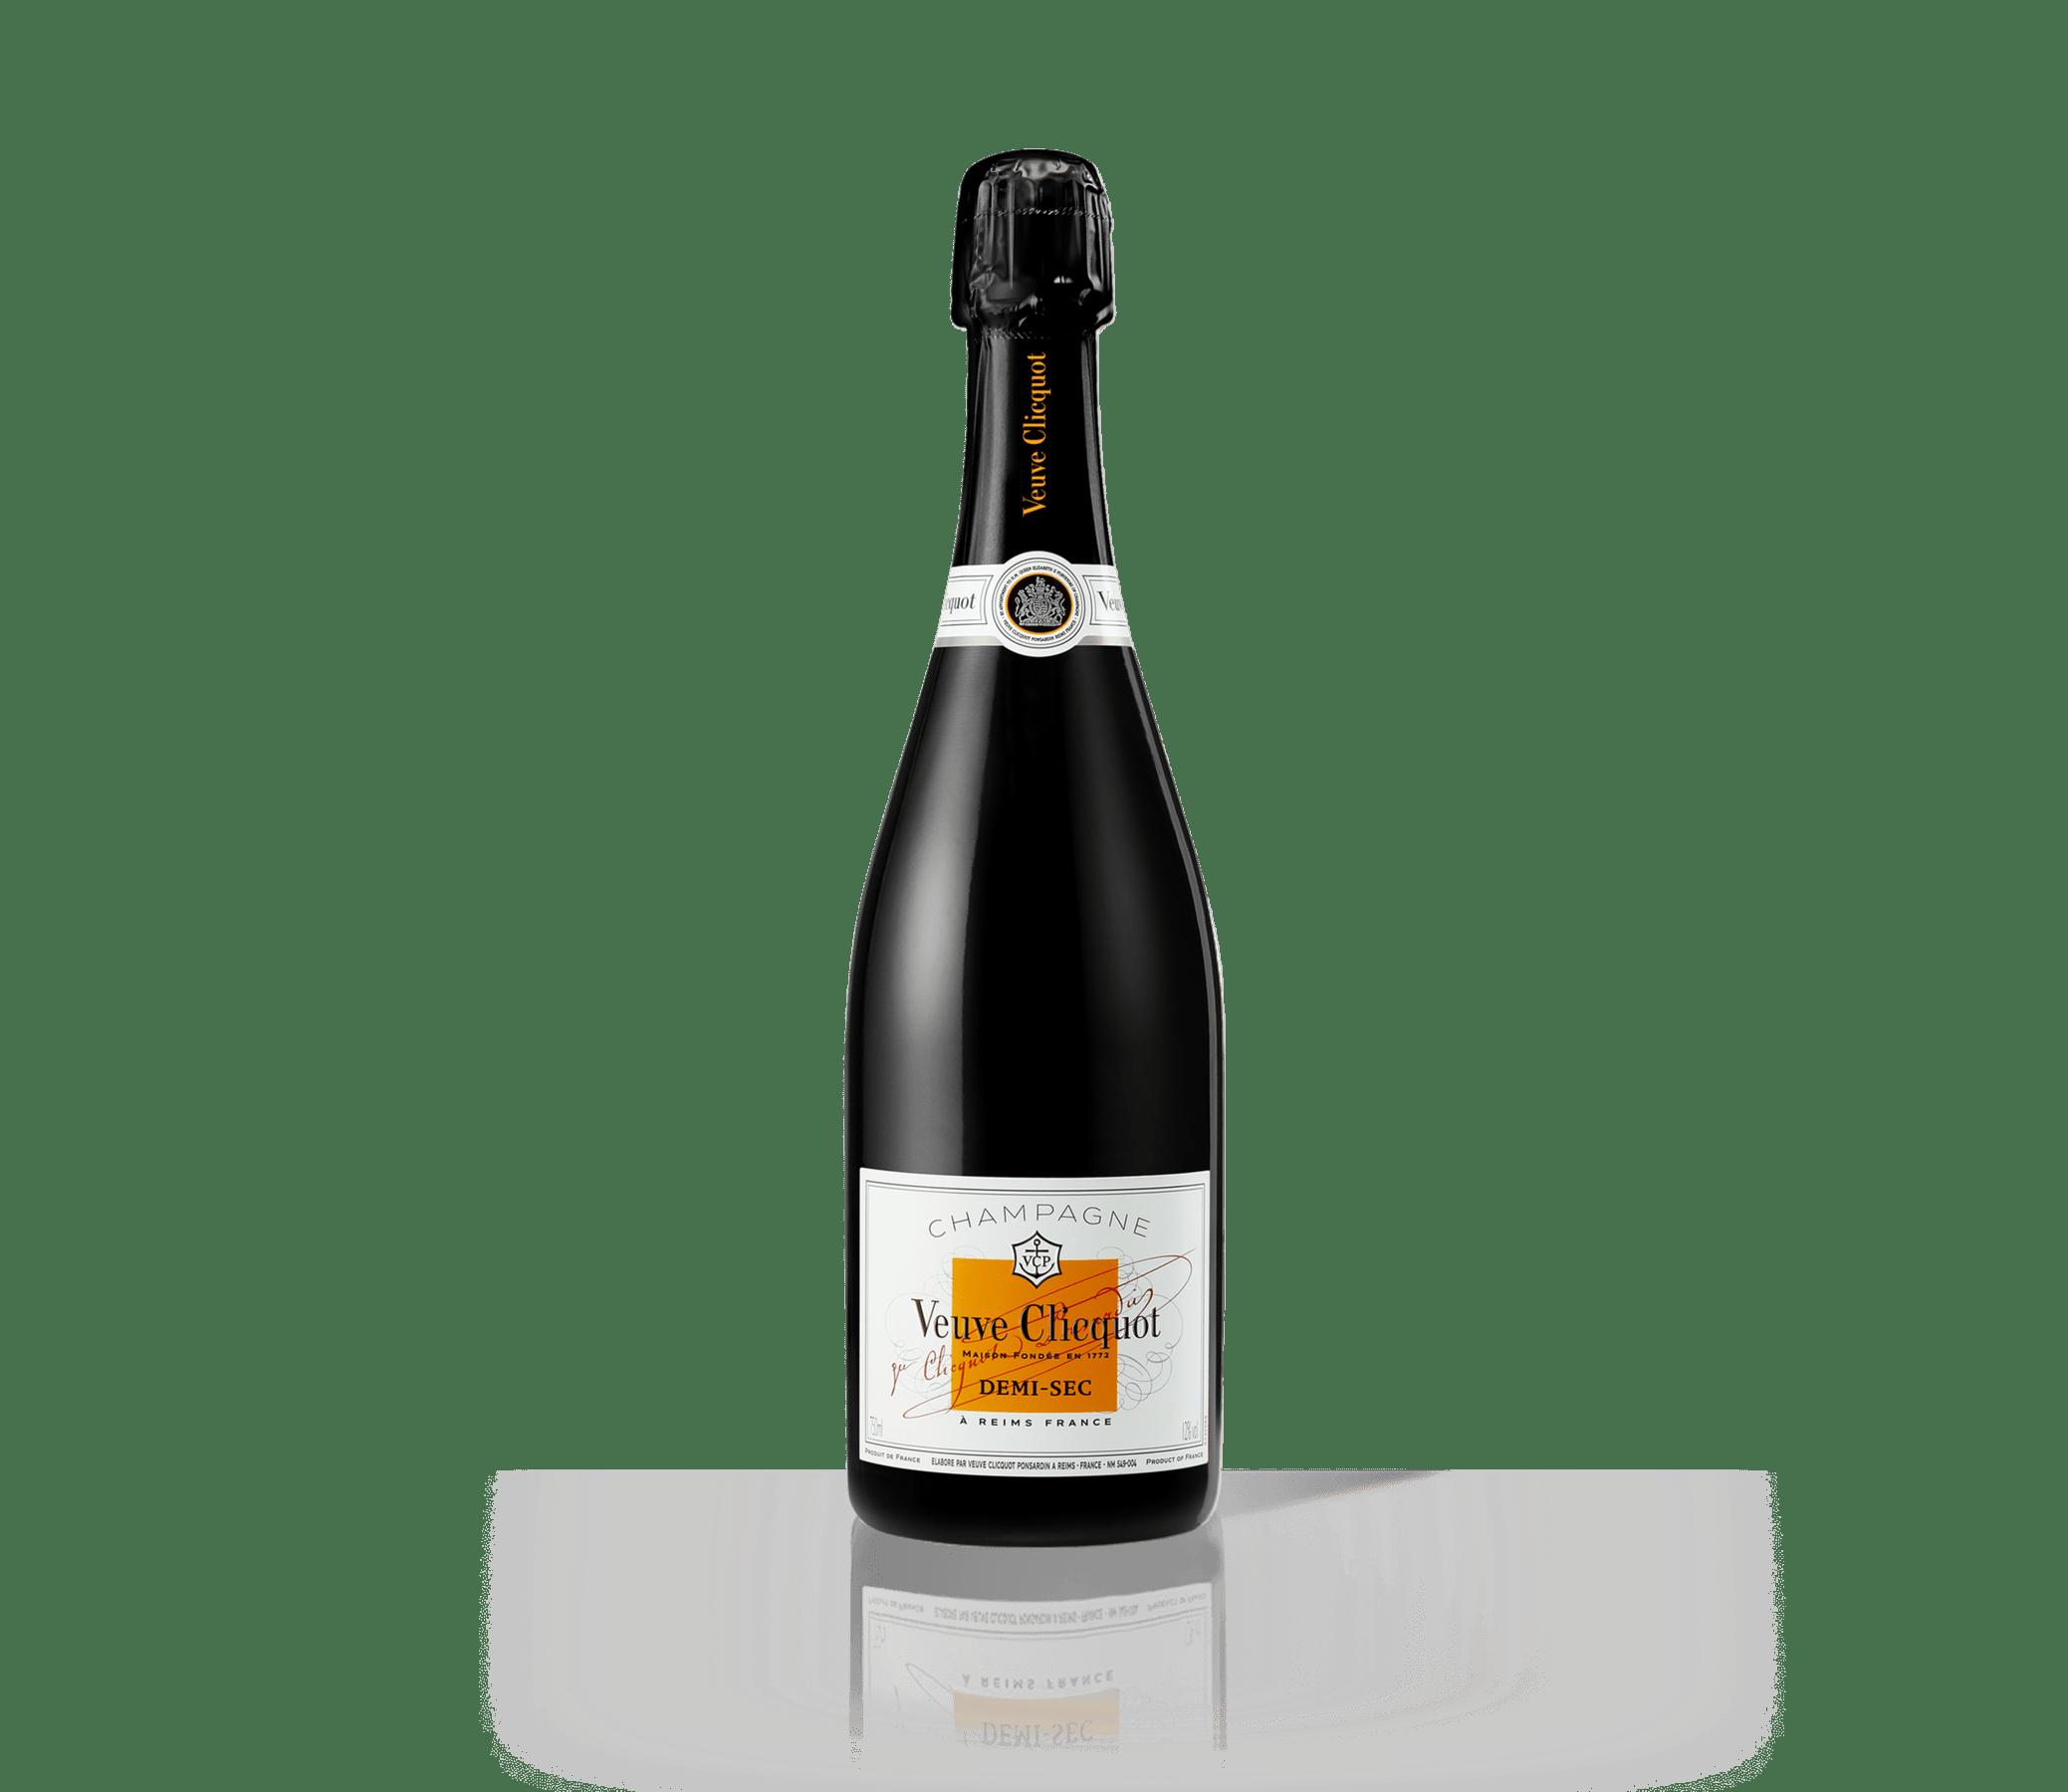 Бутылка шампанского Veuve Clicquot Demi-Sec